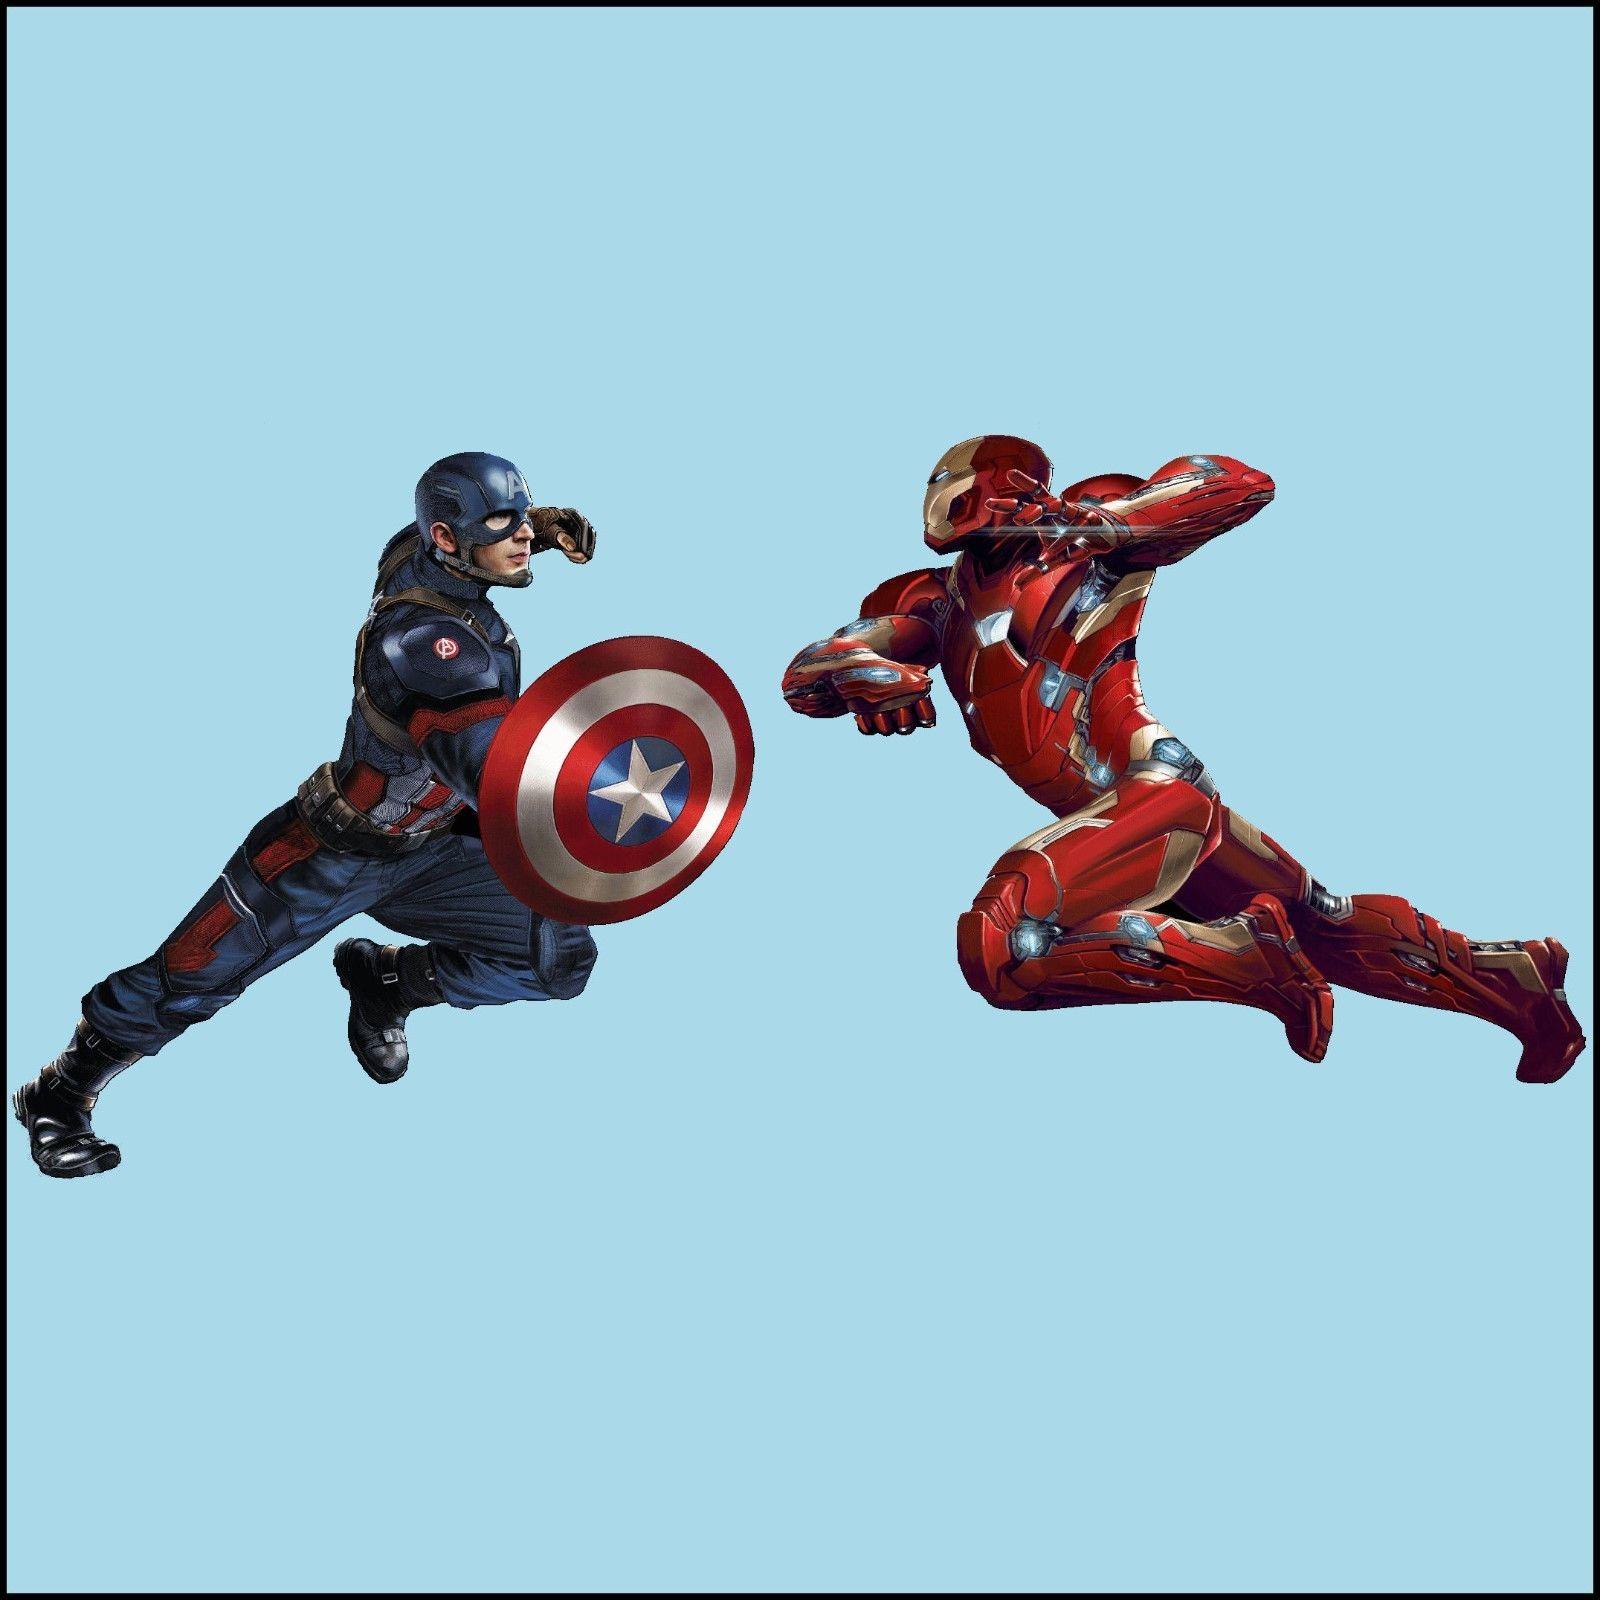 Large Civil War Iron Man Captain America fight scene Wall ...